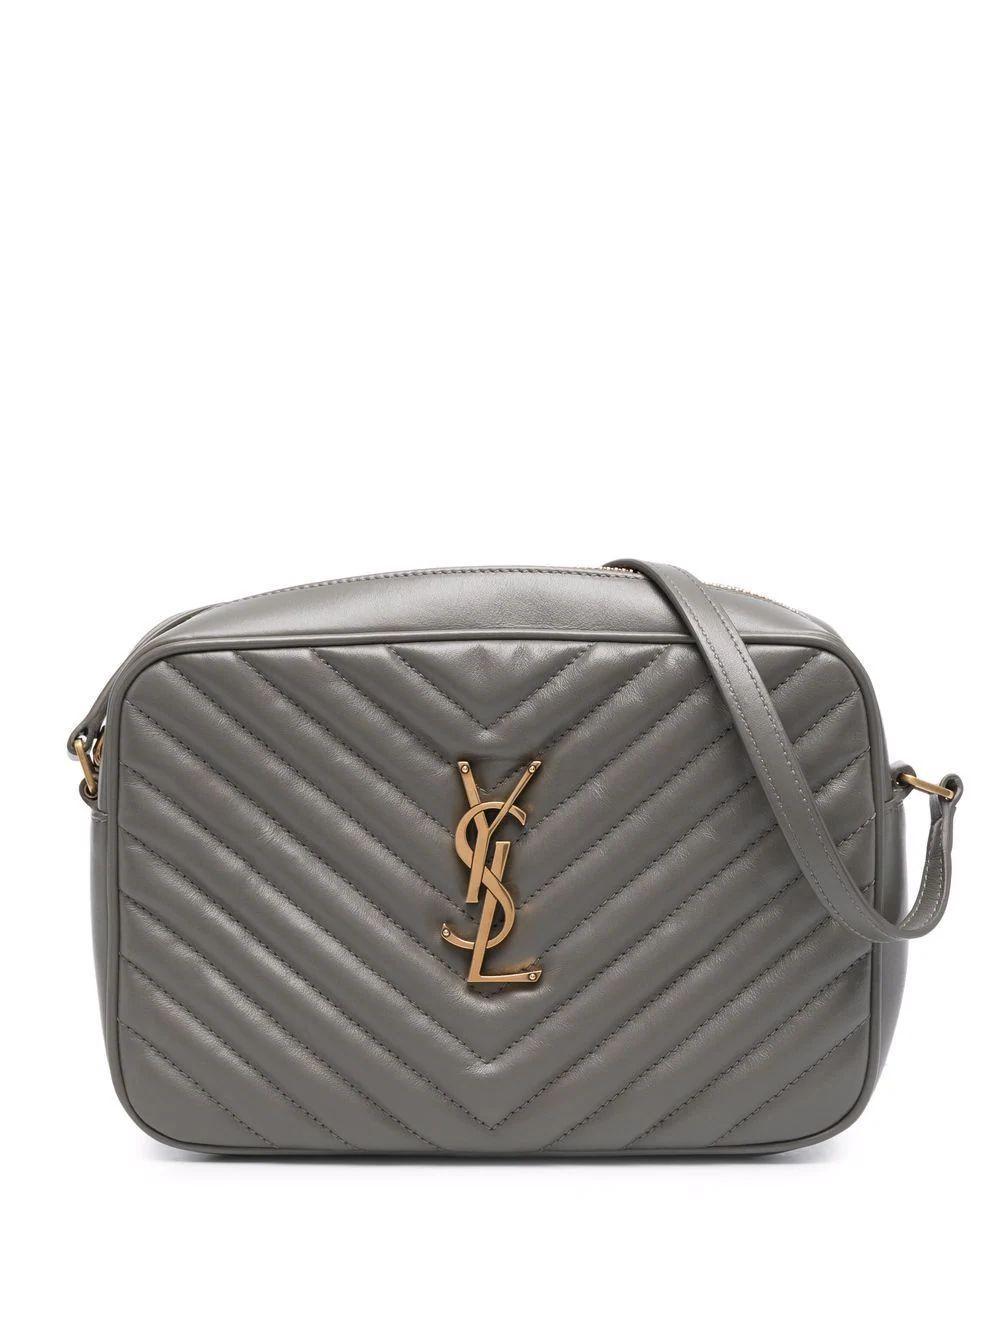 Lou Camera Bag Item # 612544DV707